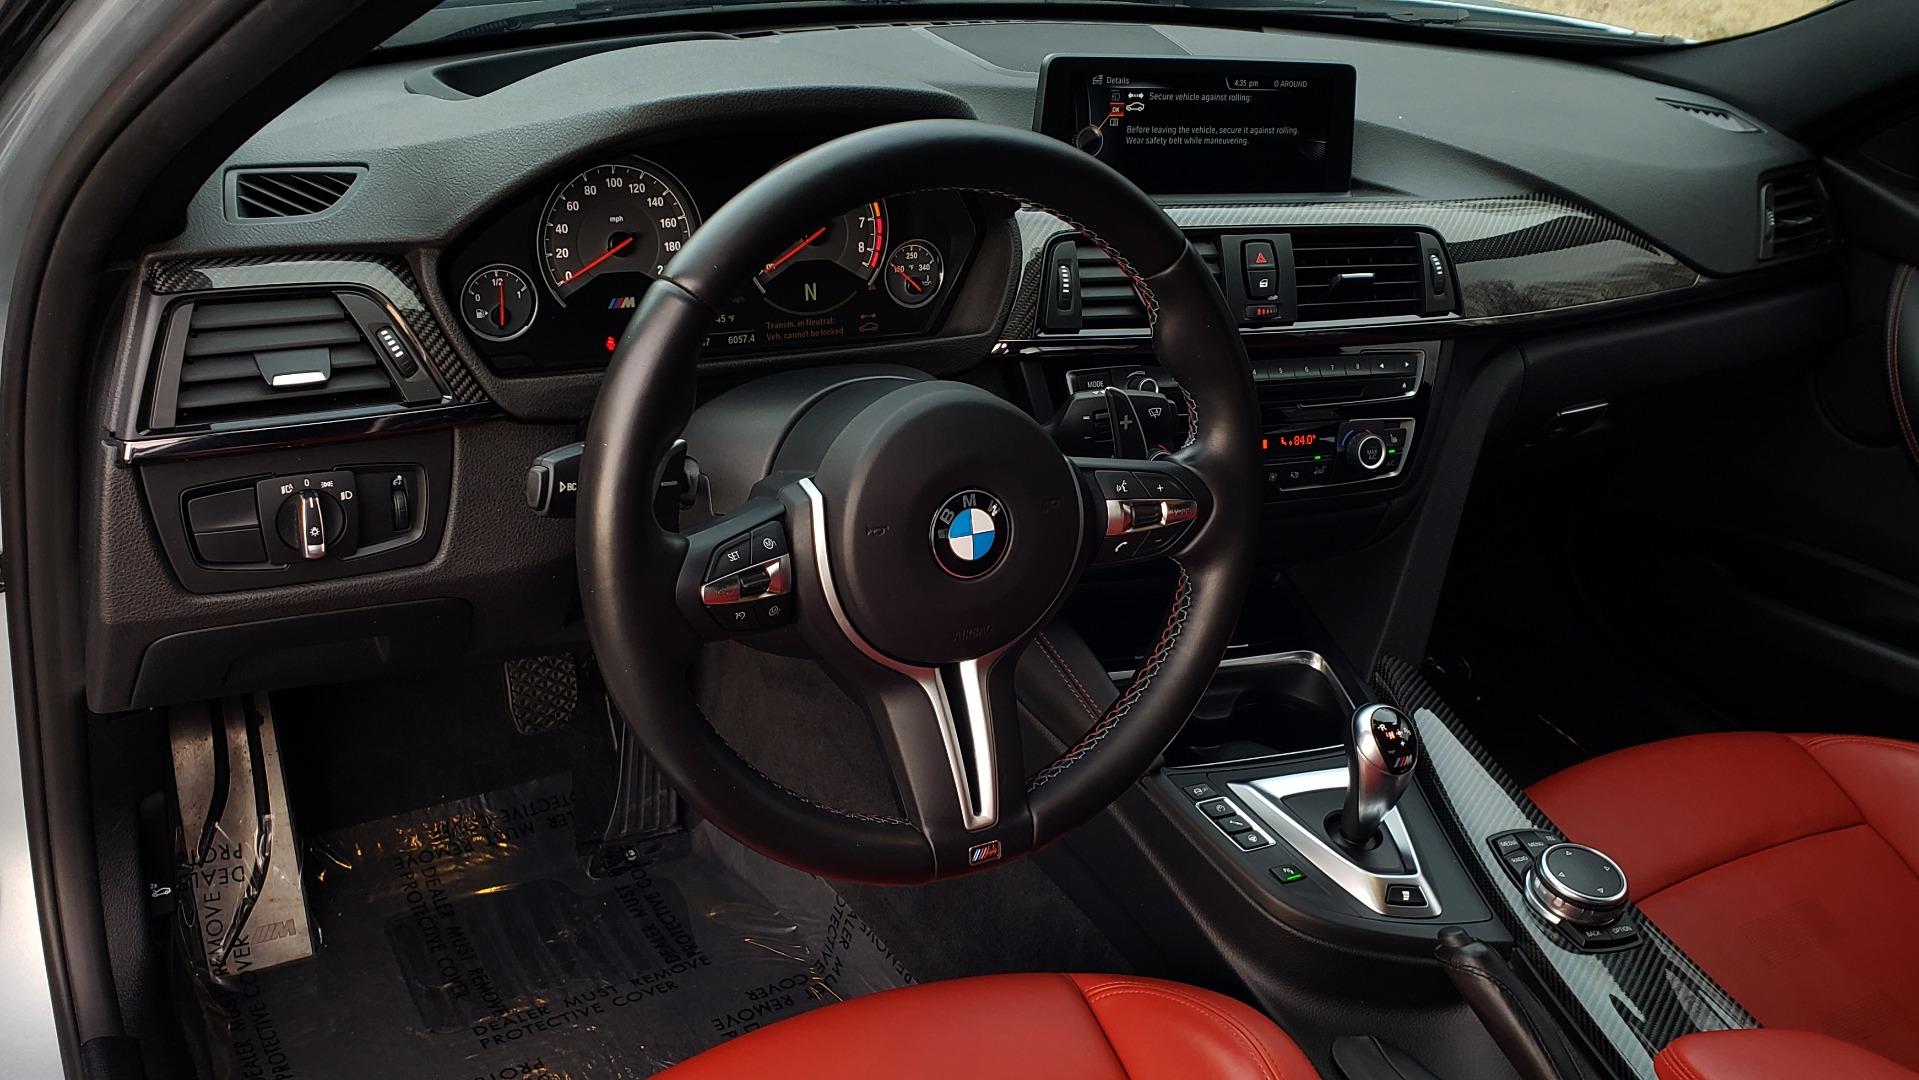 Used 2015 BMW M3 EXECUTIVE PKG / NAV / CAMERA / HUD / CARBON FIBER ROOF for sale Sold at Formula Imports in Charlotte NC 28227 54